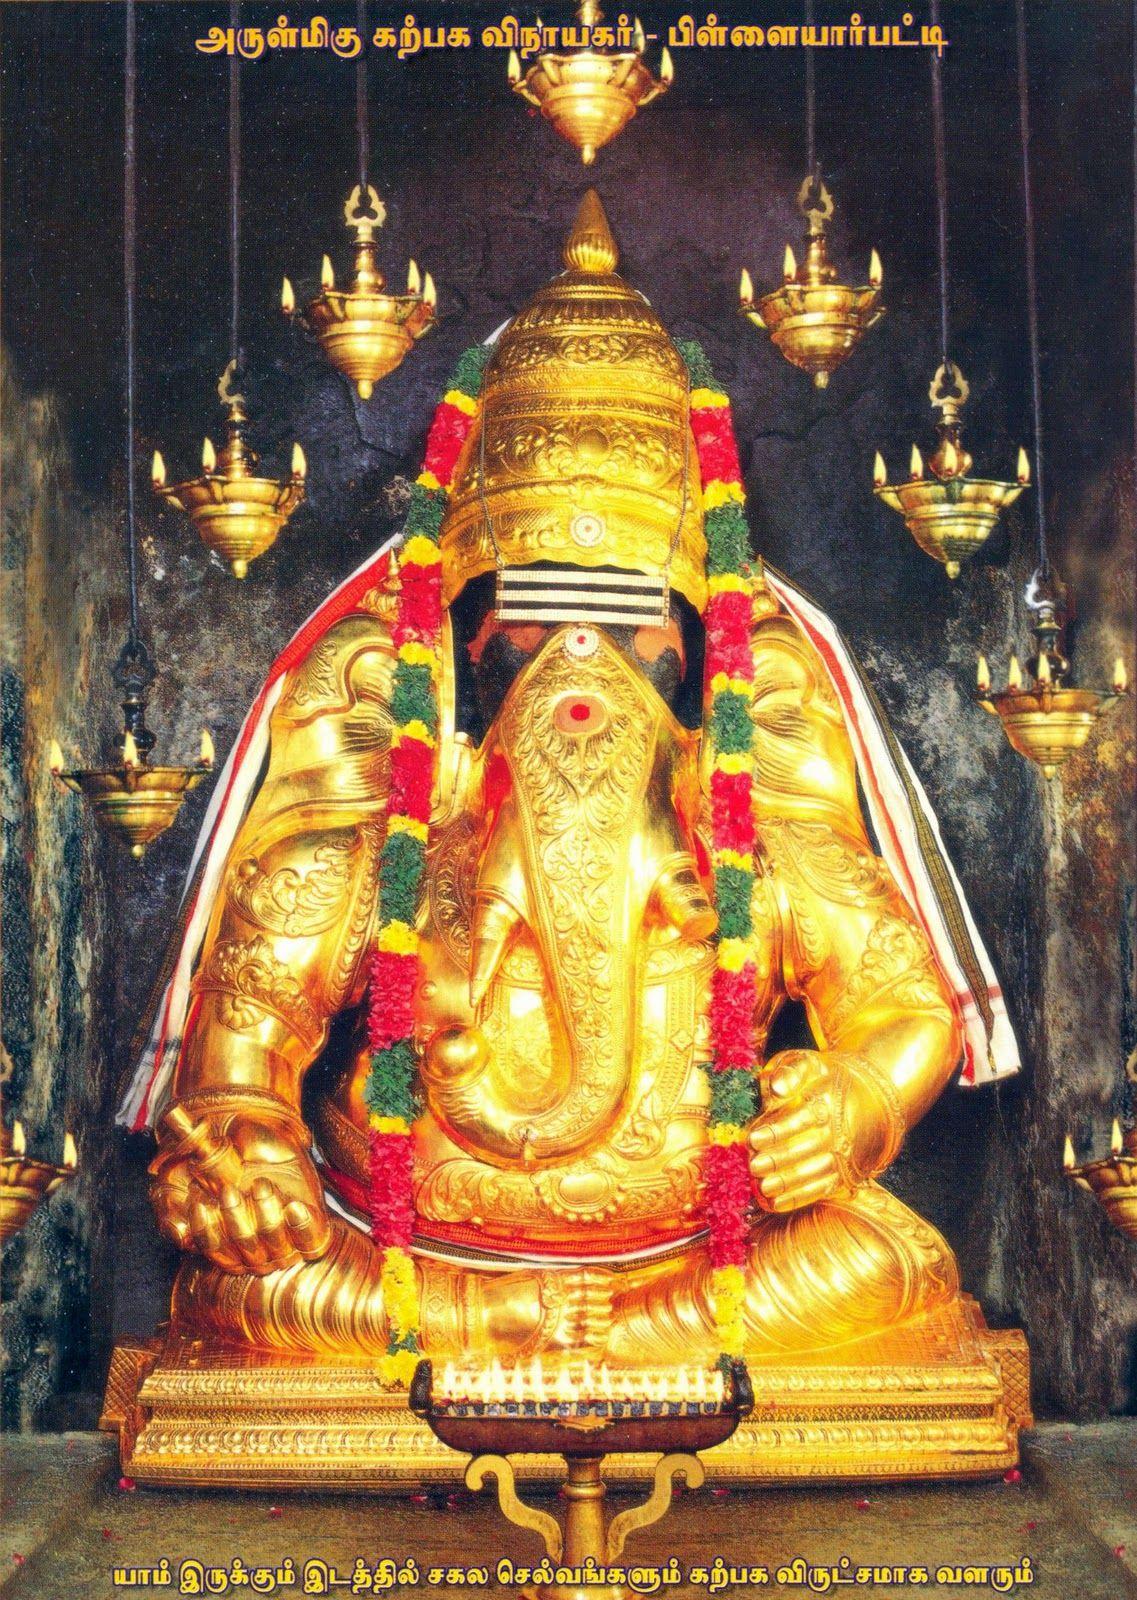 Karpaga Vinayagar Temple Pillaiyarpatti Ganesh By J09 Online In